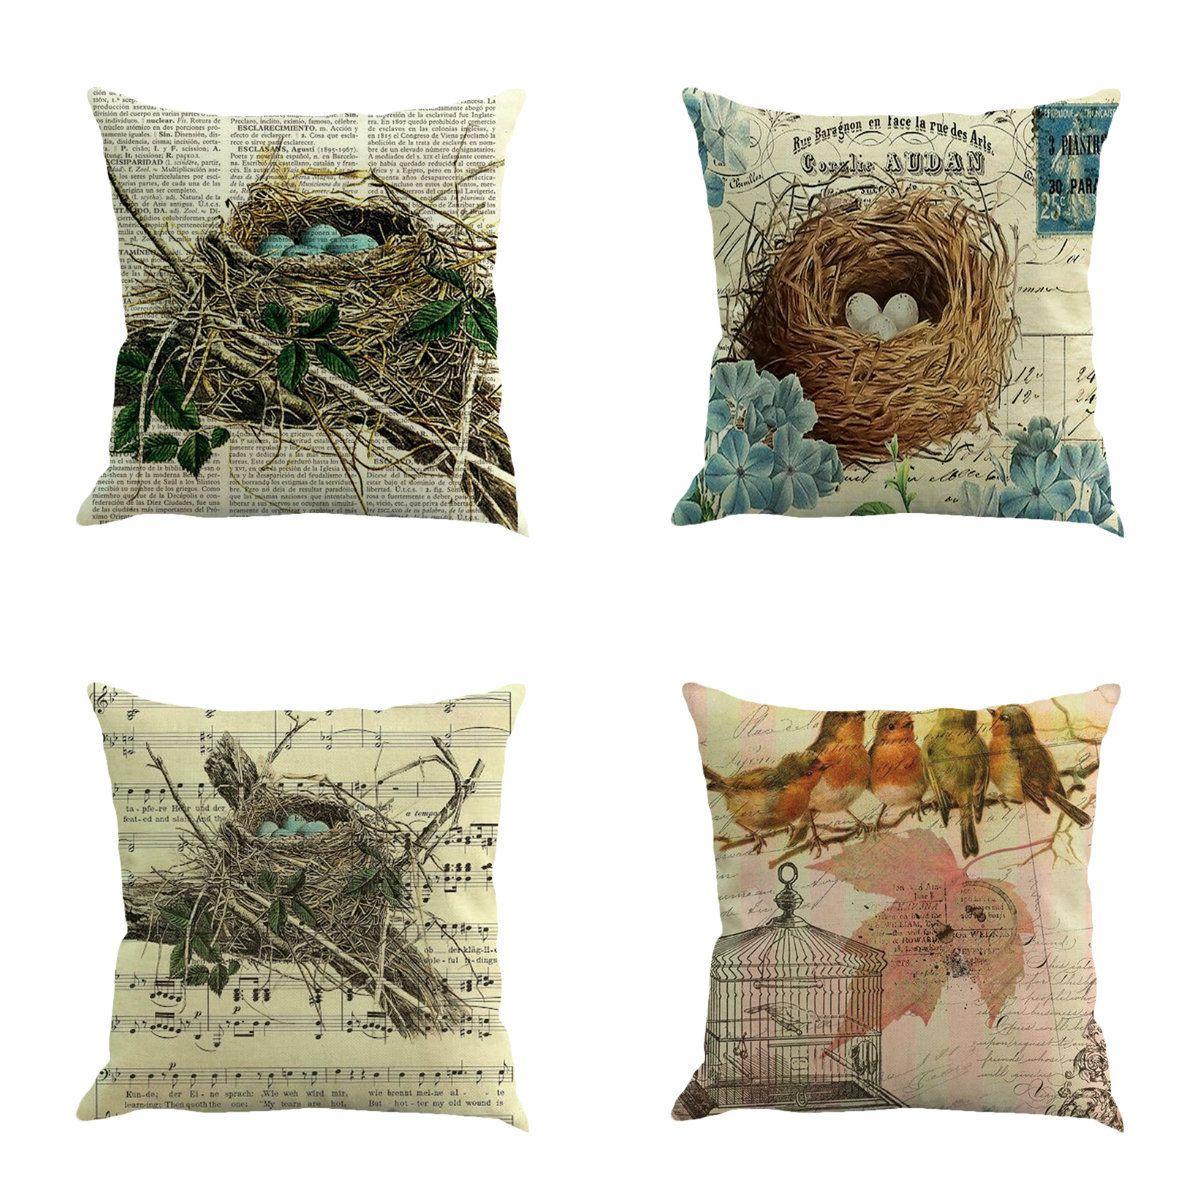 Custom Made Decorative Throw Pillows Cushion Covers Pillow Cover 24